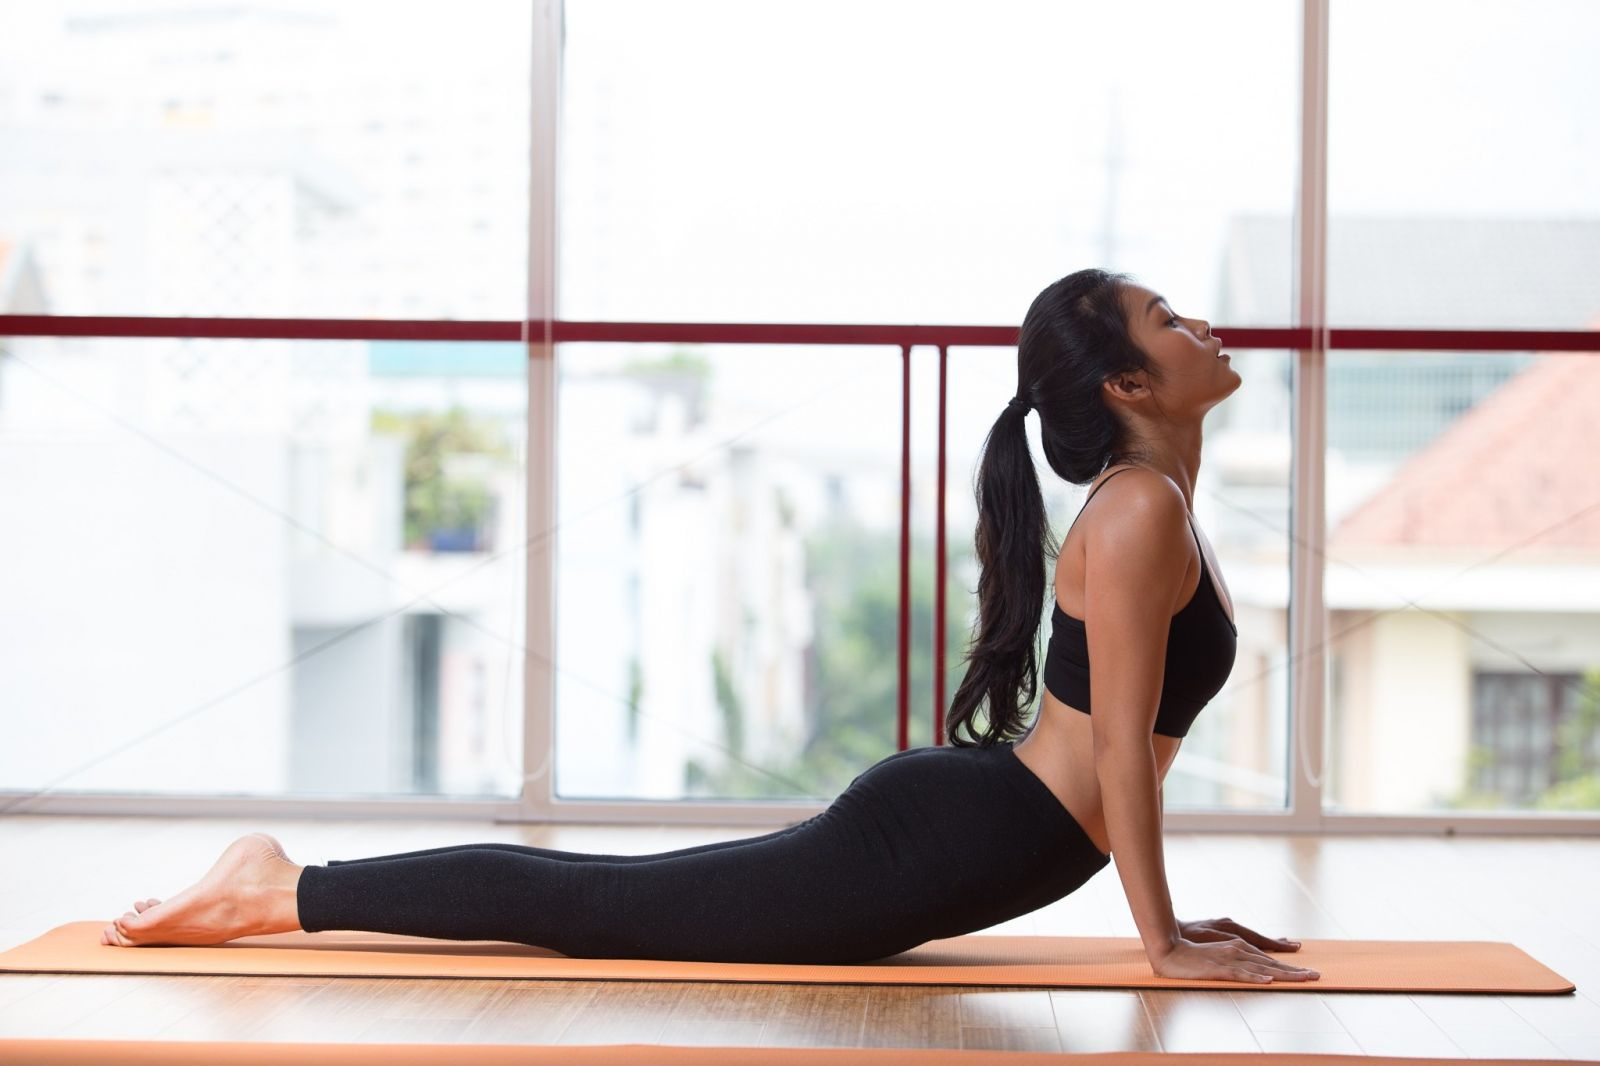 Yoga poses Rắn Hổ Mang